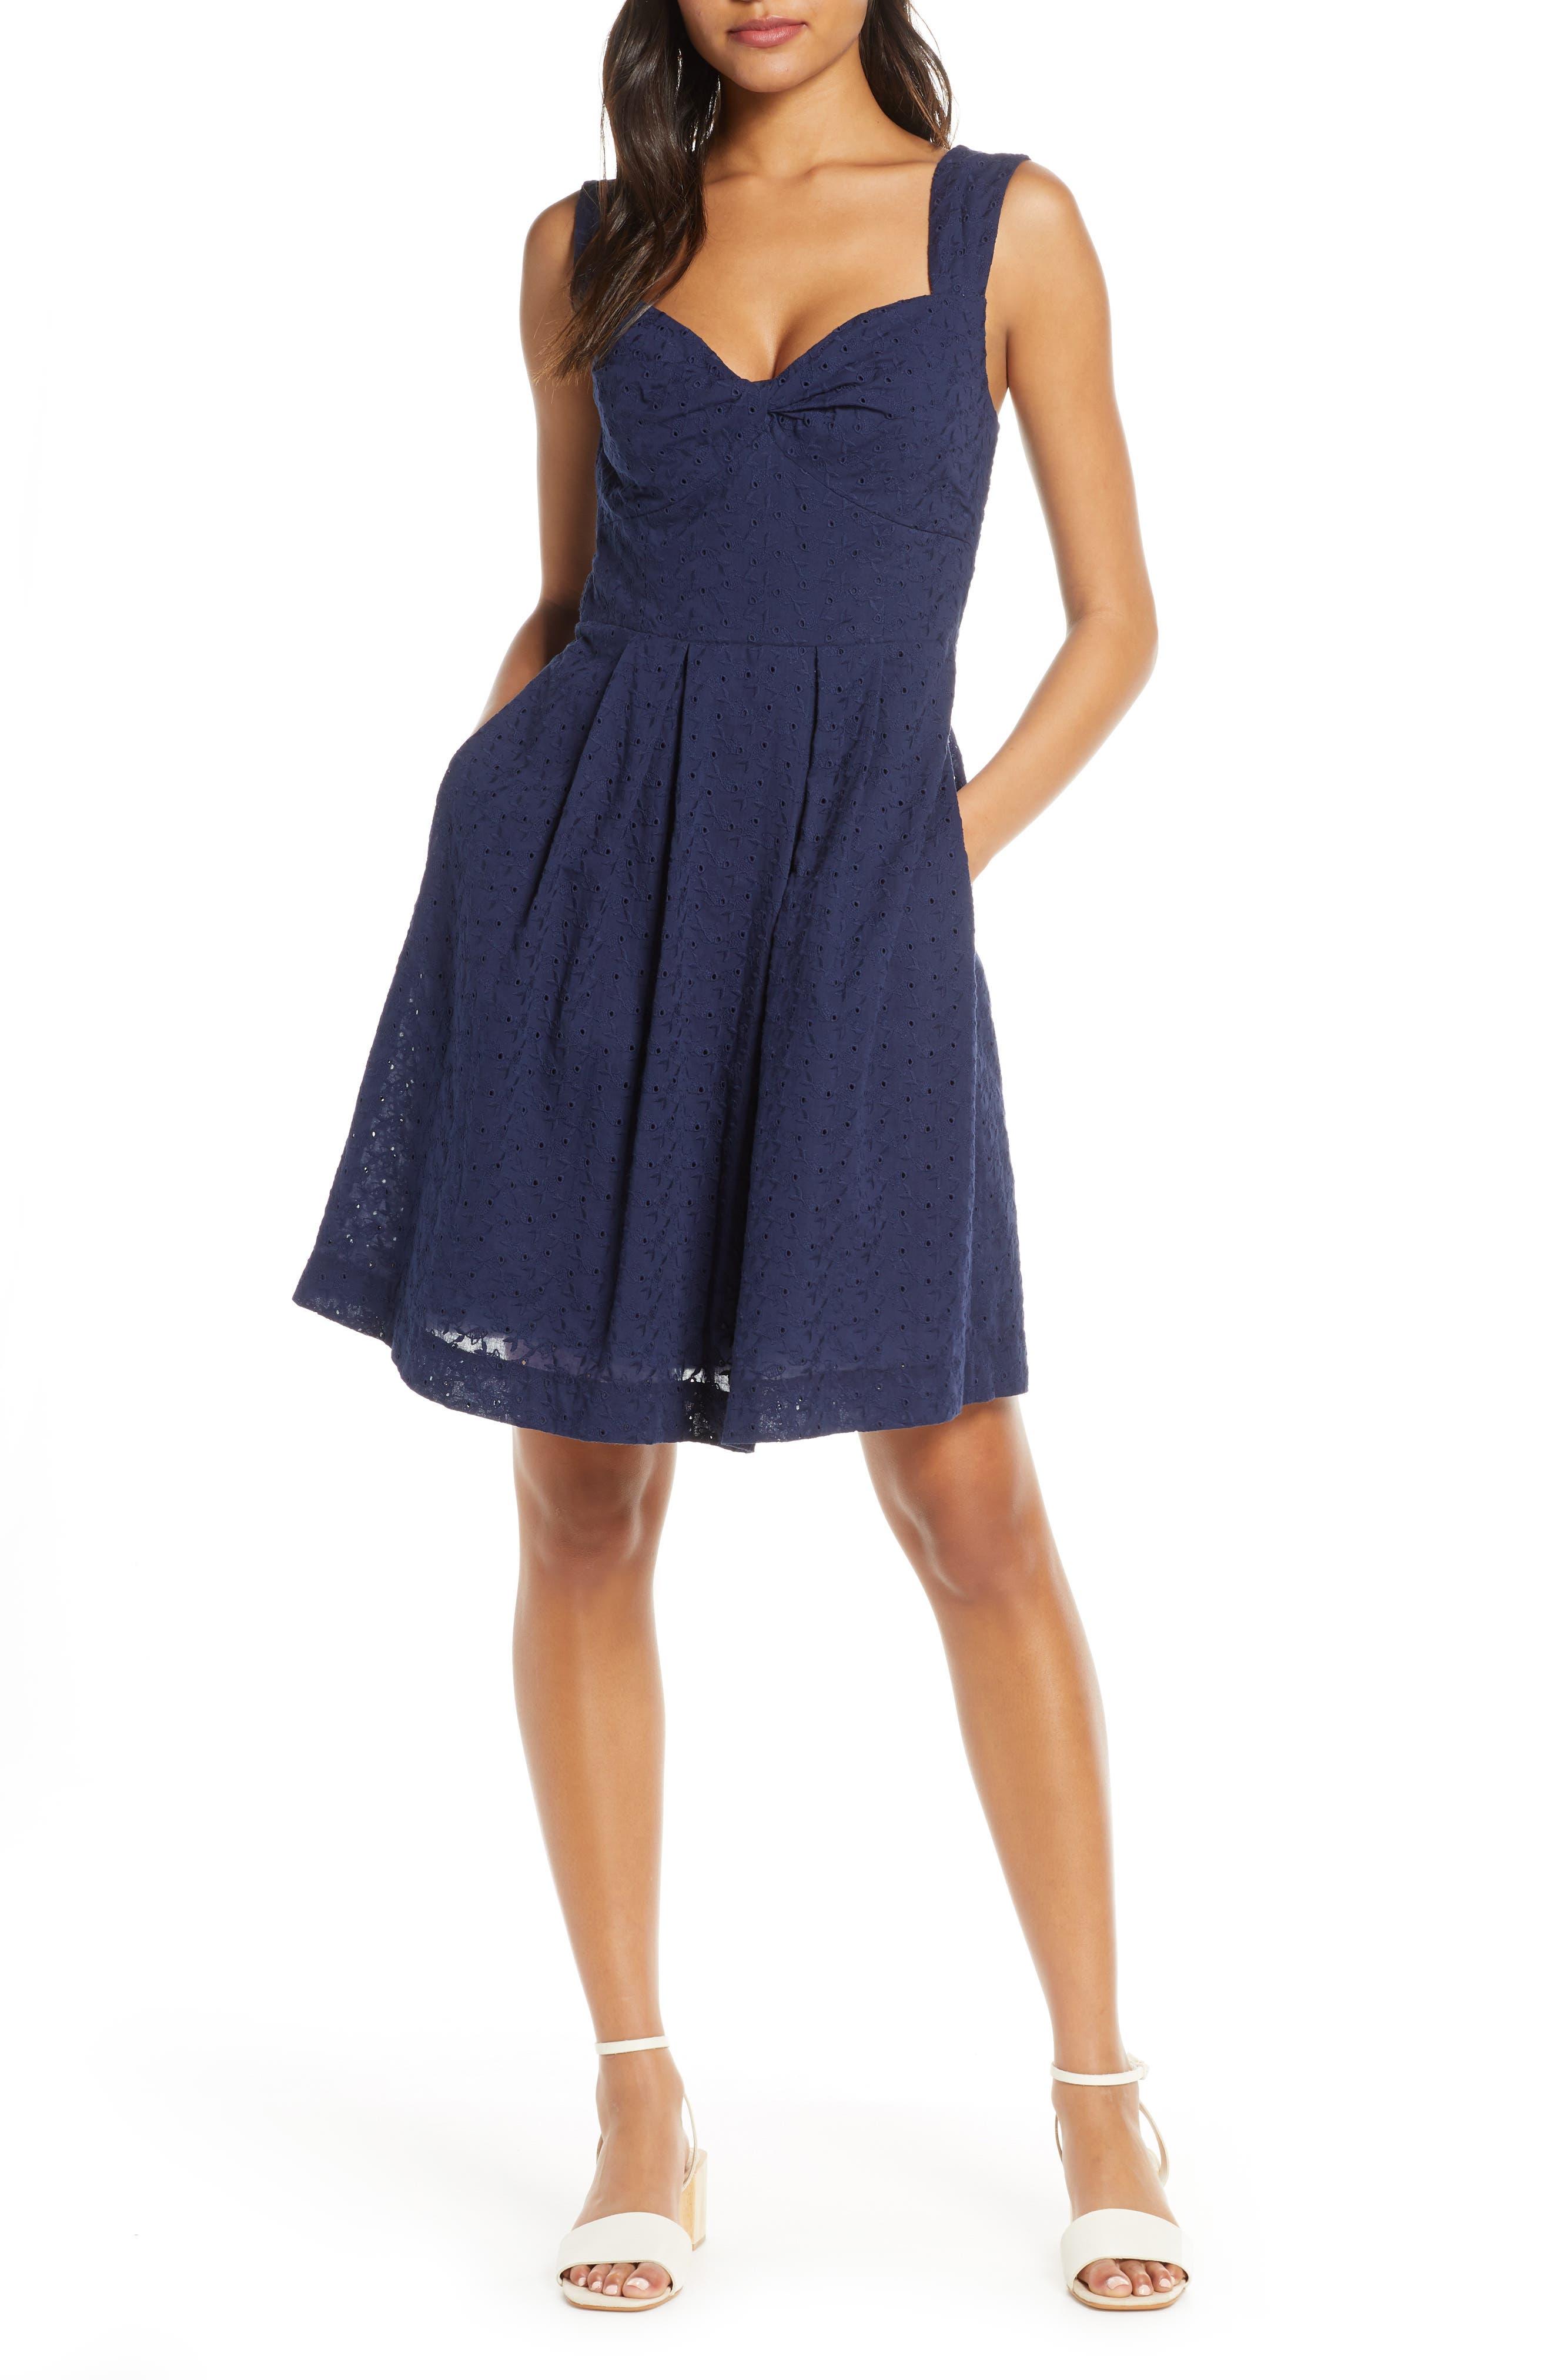 Lilly Pulitzer Cyndi Fit & Flare Dress, Blue